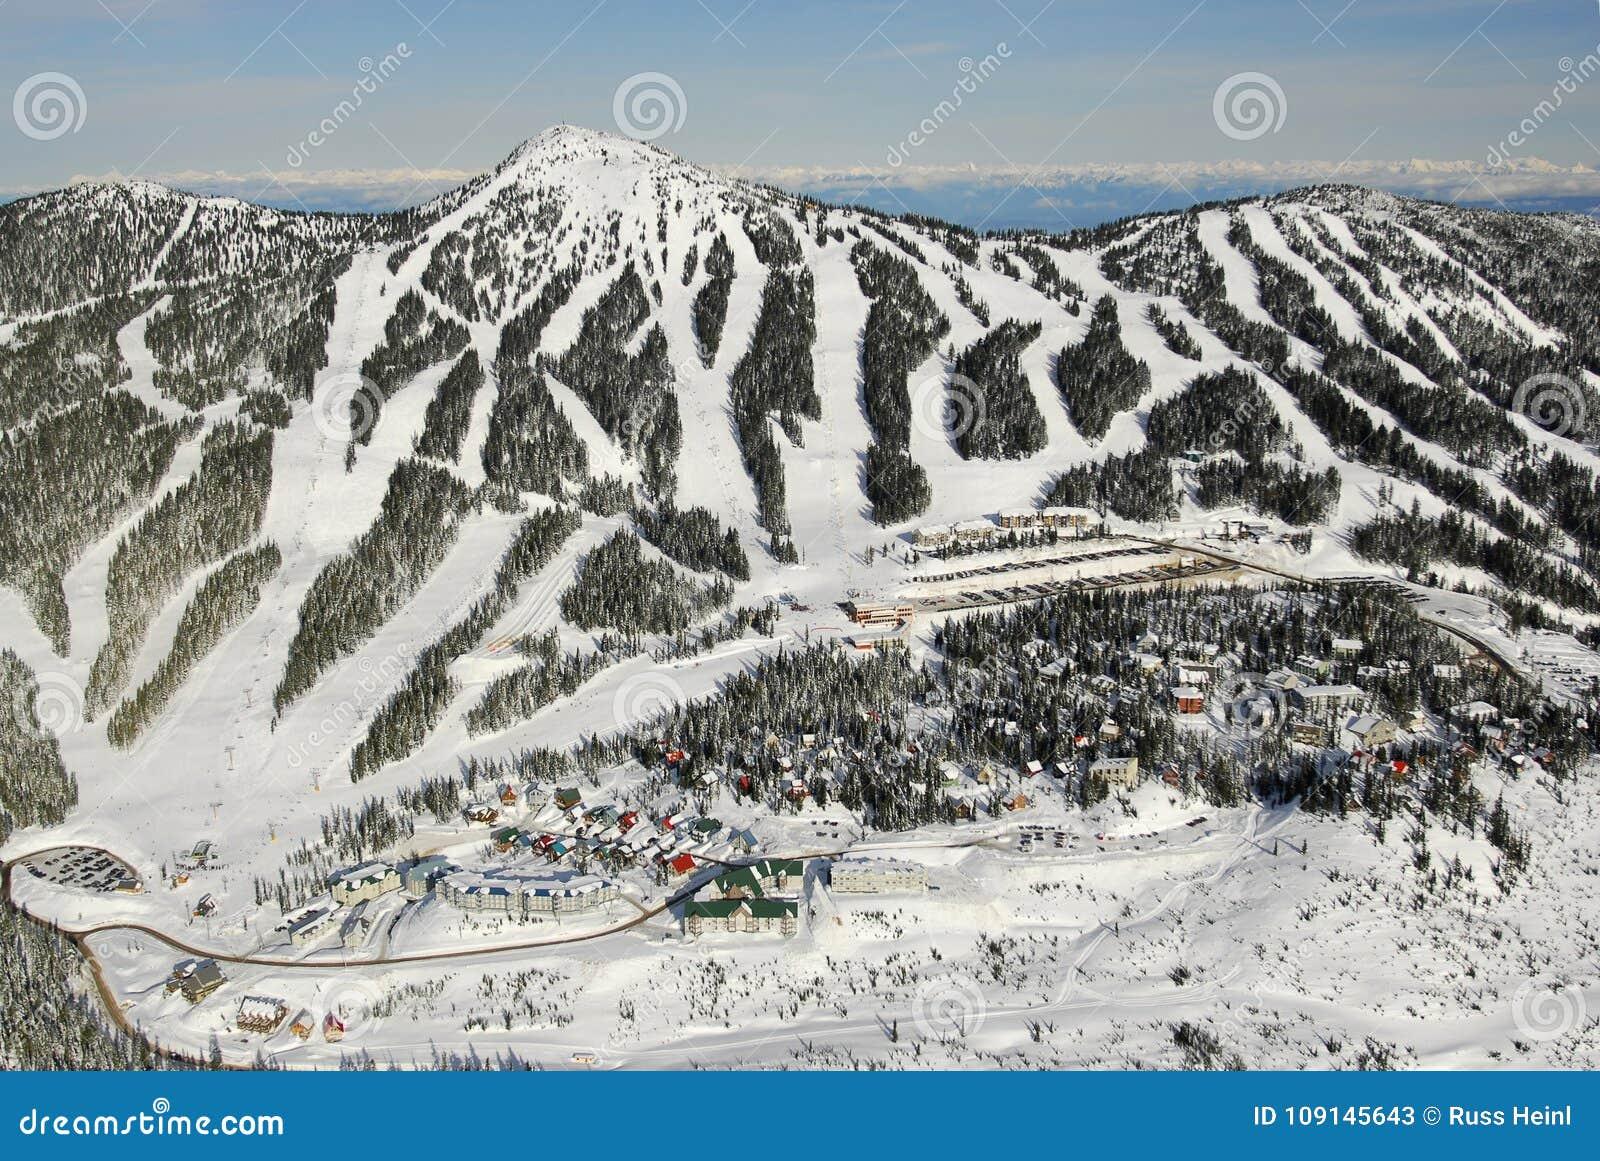 aerial image of mt. washington alpine ski resort, vancouver island